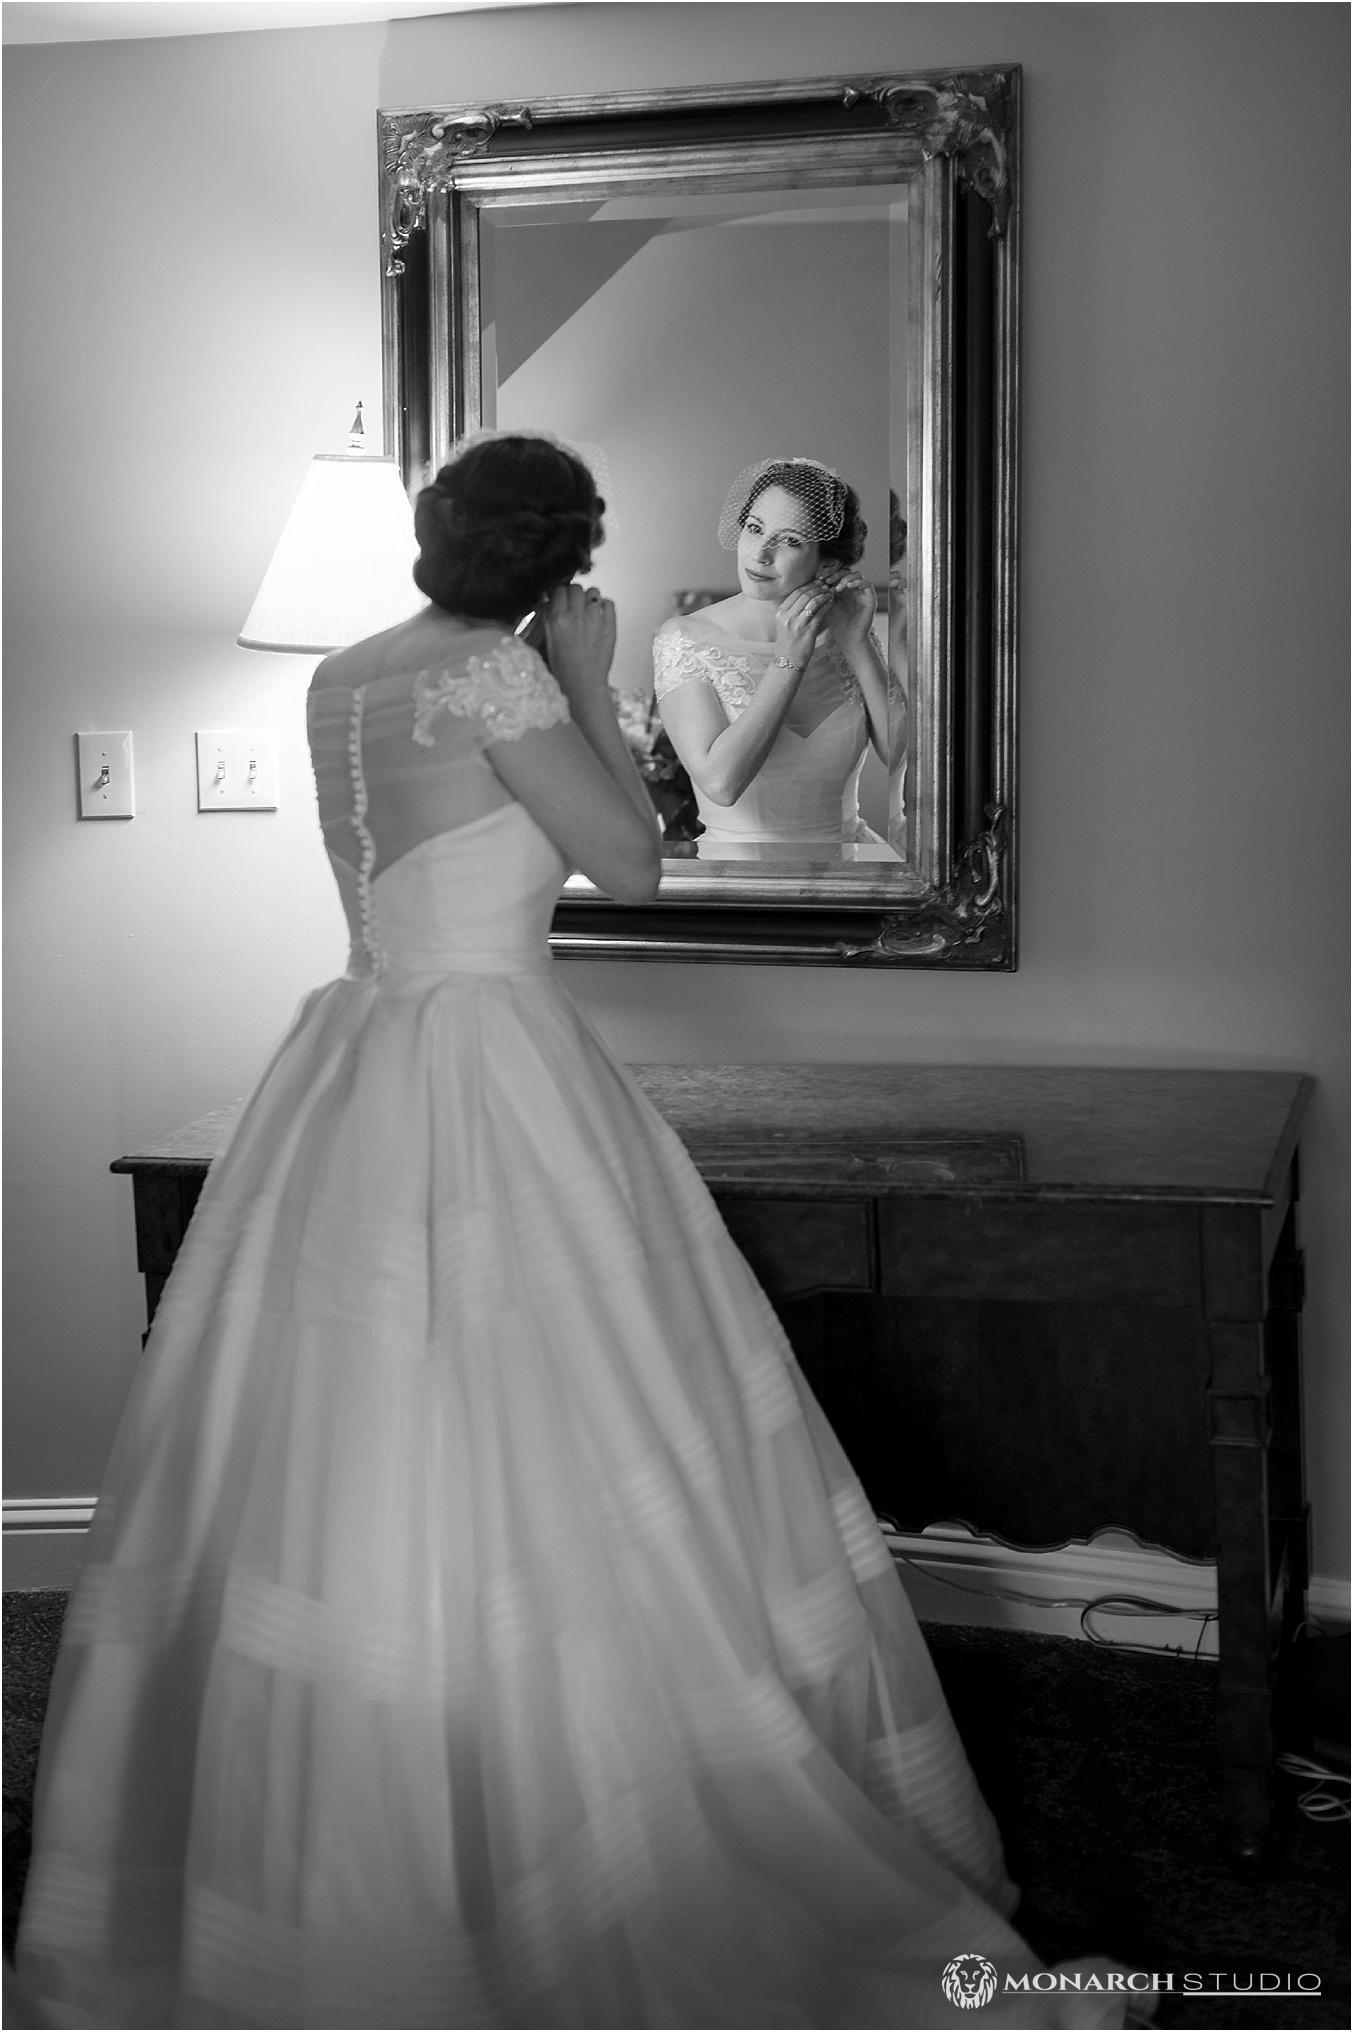 010-st-augustine-wedding-photographer-.jpg